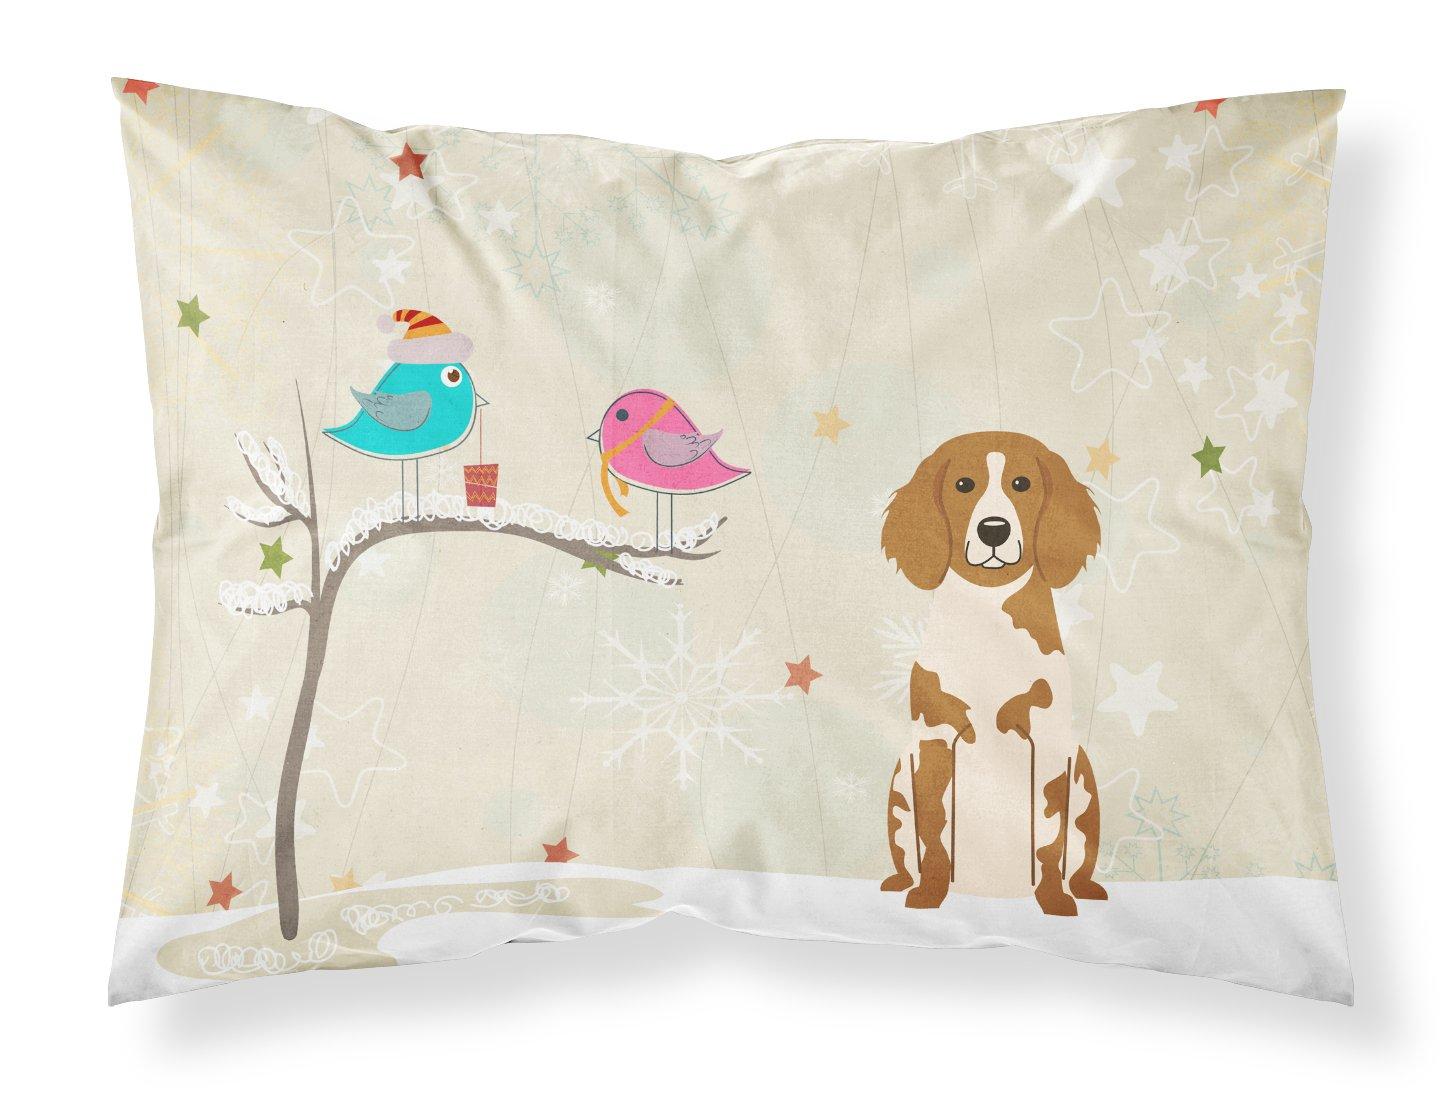 Set of 2 2 Pc Sea Shell Pillowcase Cushion Cover Decorative Throw Pillow Case Pillow Cover 18 X 18 Inch 45 X 45 Cm COMIN16JU027938 Queenie/® Conch /& Coral Tree